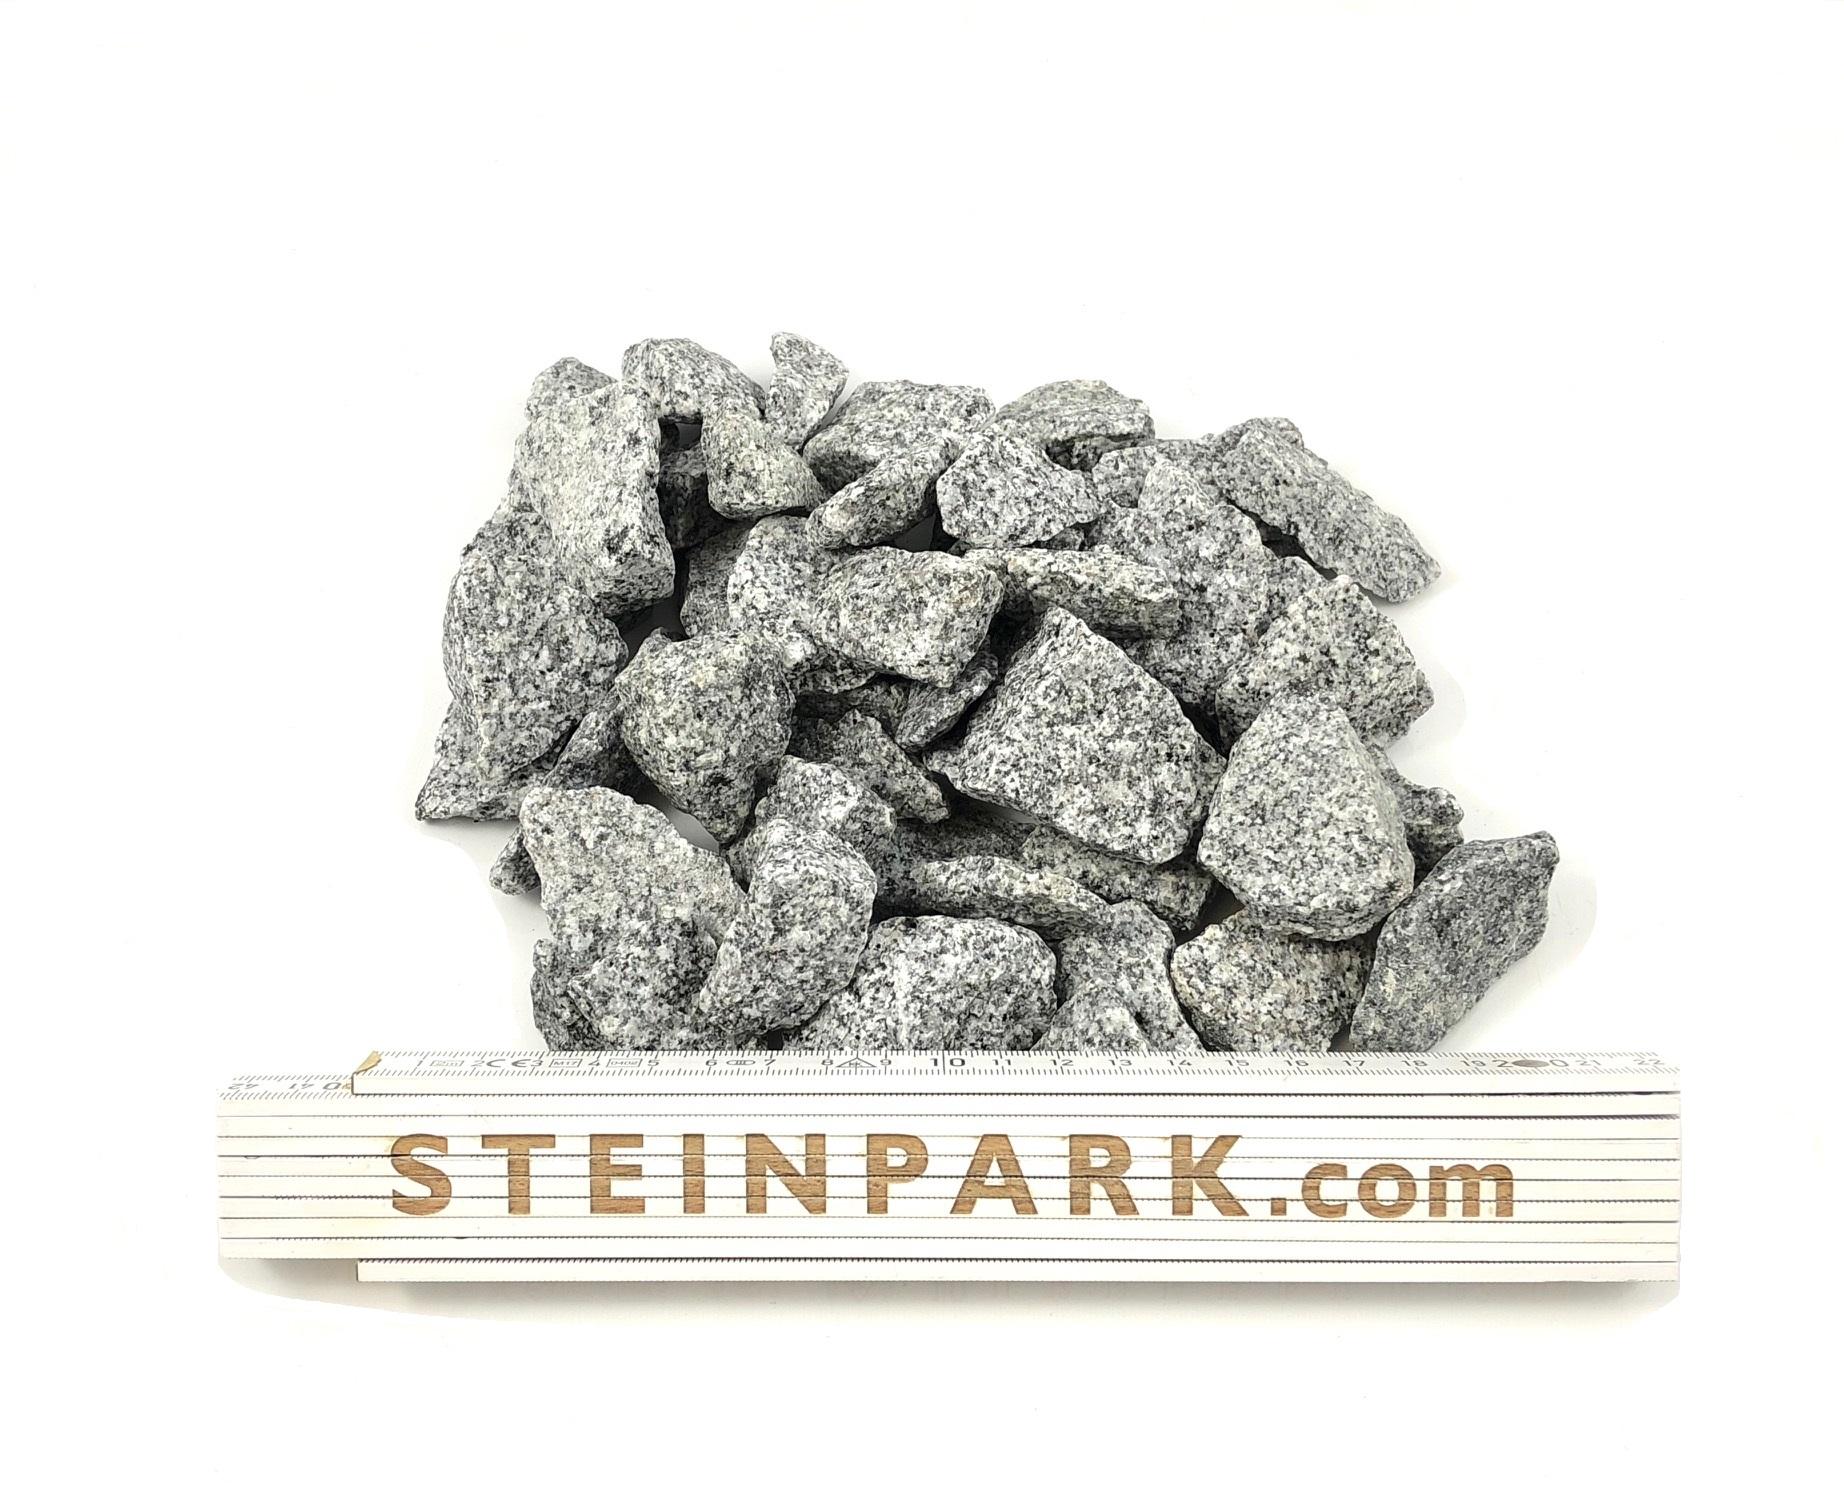 Ziersplitt Granit Silver Gris 8-16 mm hellgrau